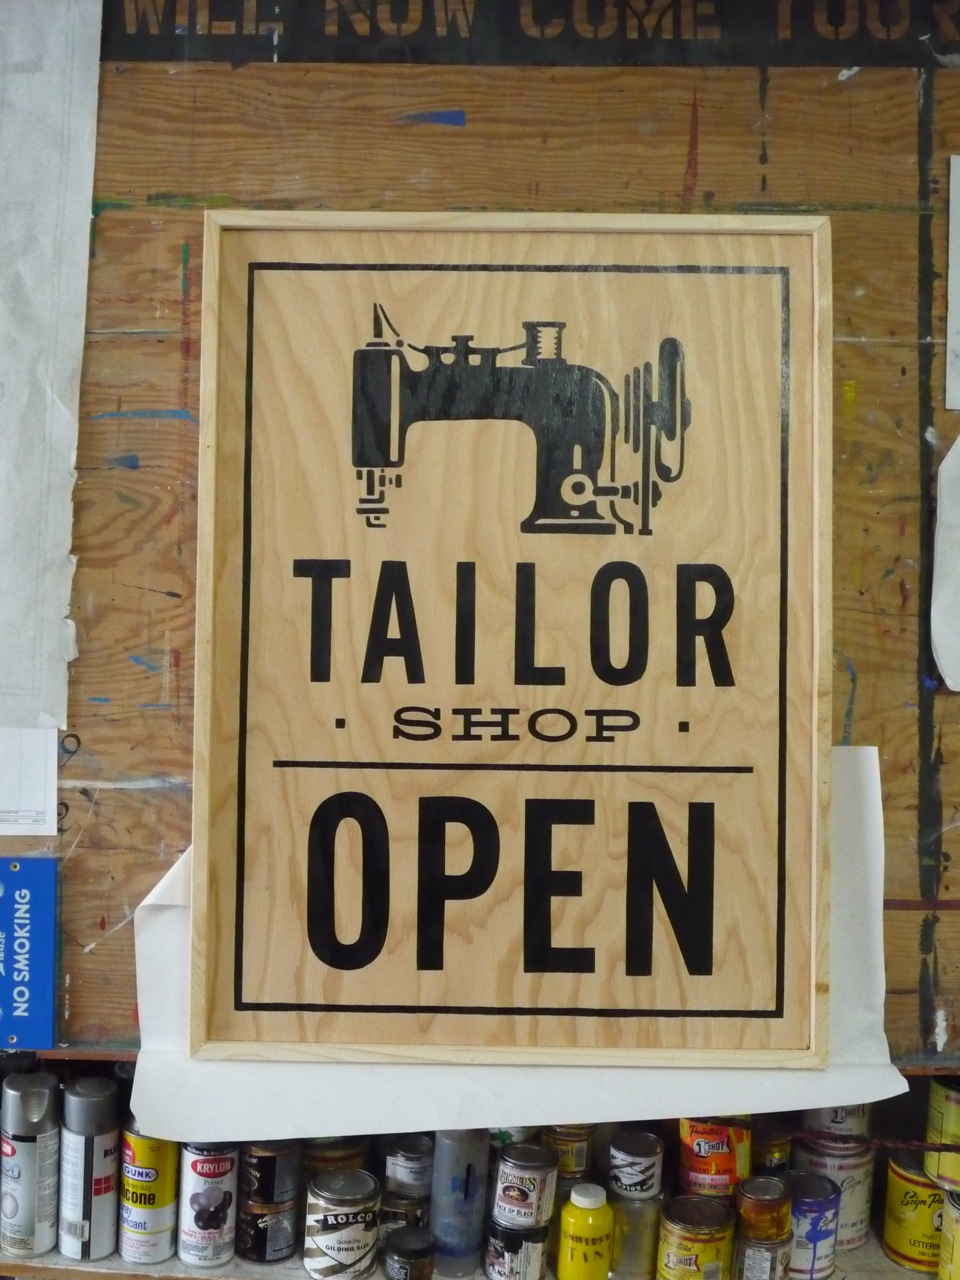 HAND-levis-tailorshop_5878239422_o.jpg